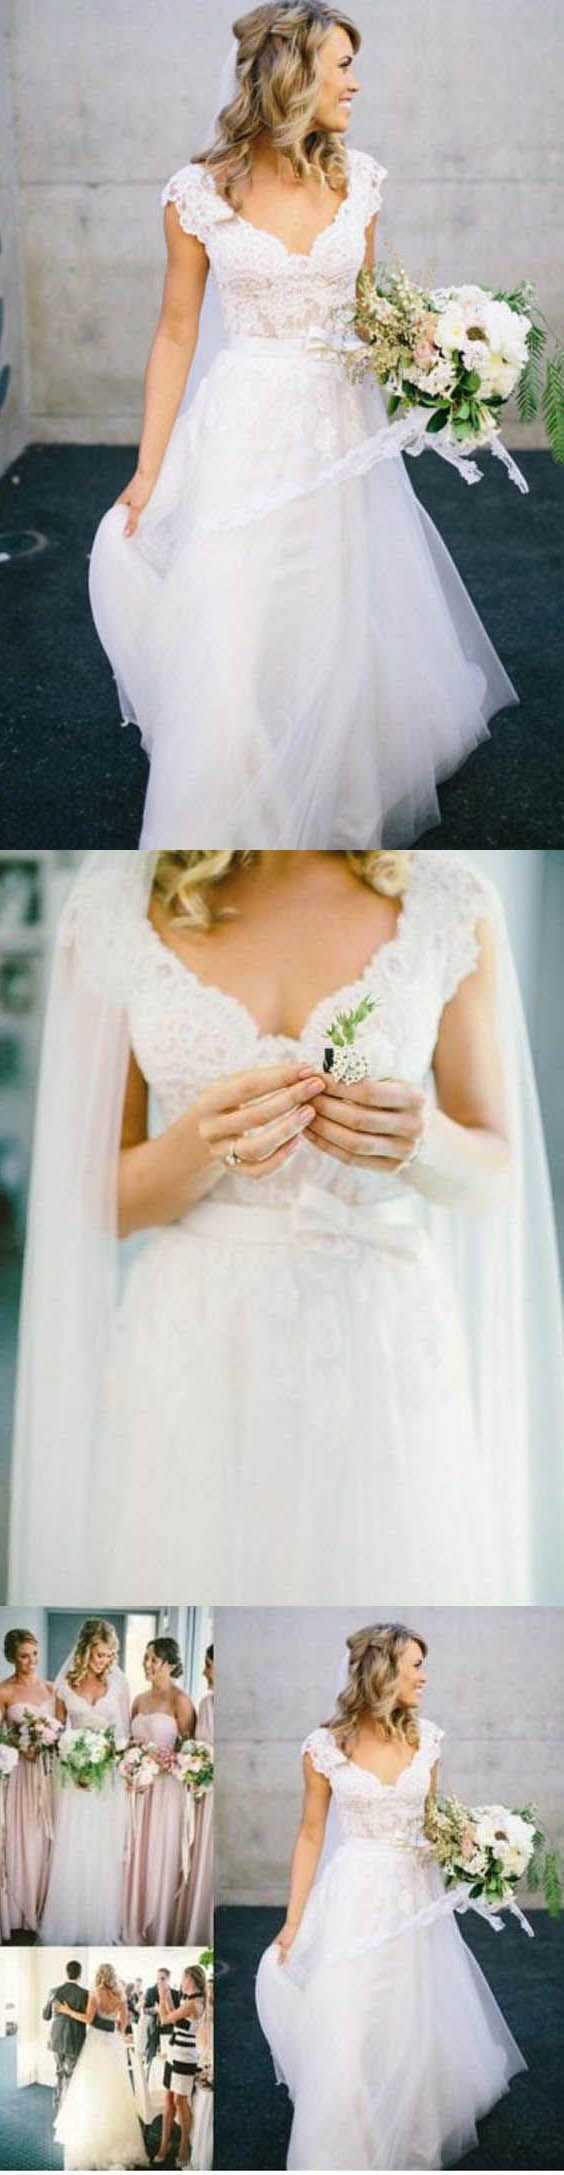 Boat neck lace wedding dress october 2018  best Wedding dress images on Pinterest